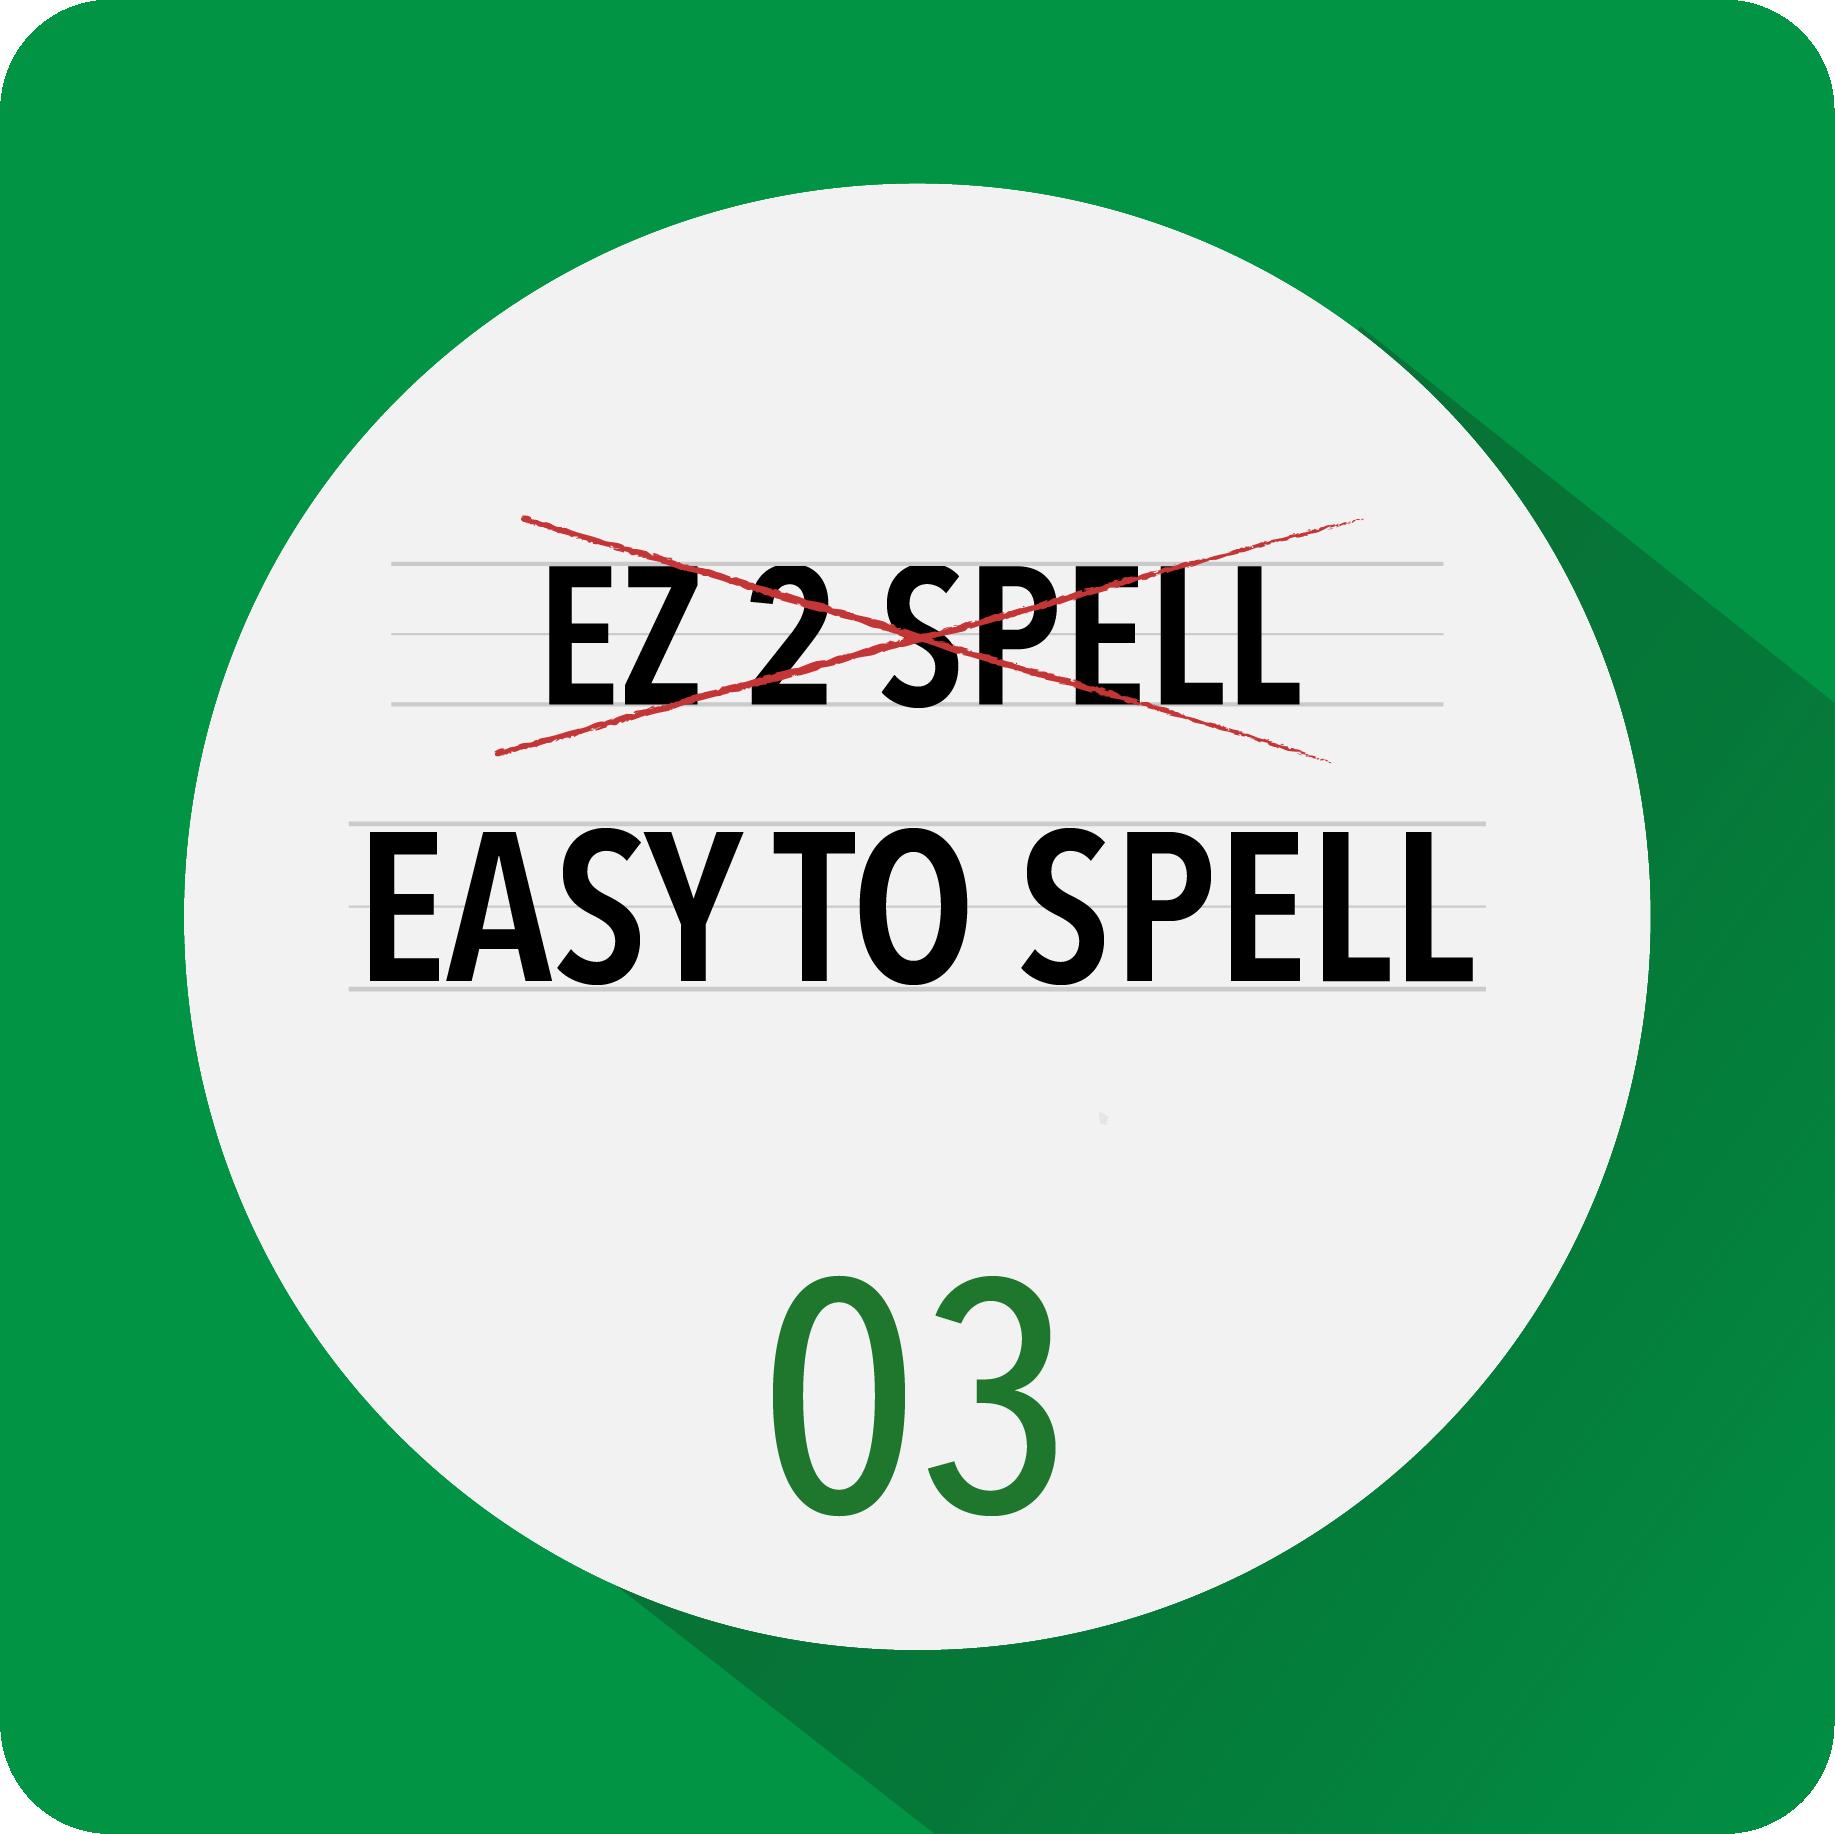 Renaming Rule 3: Be easy to spell